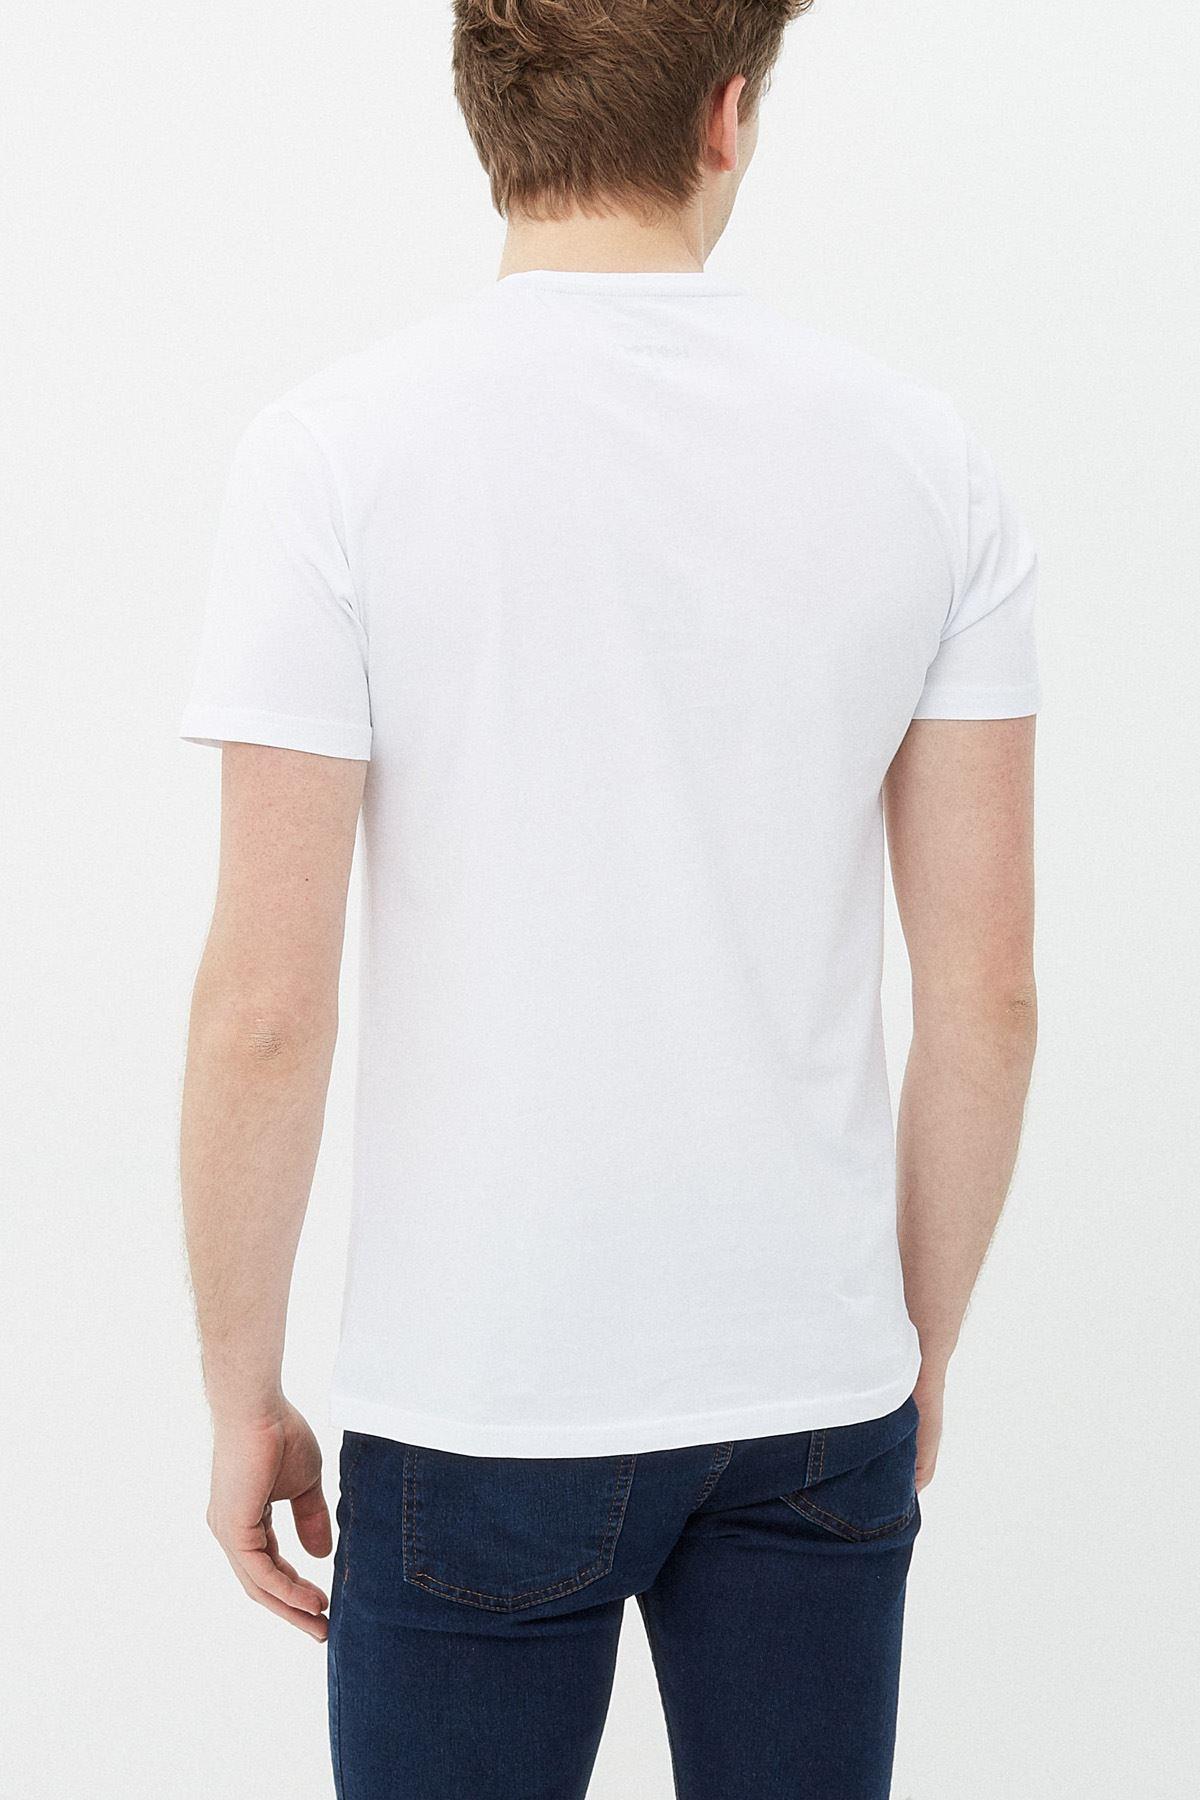 Anime Death Note 08 Beyaz Erkek Tshirt - Tişört